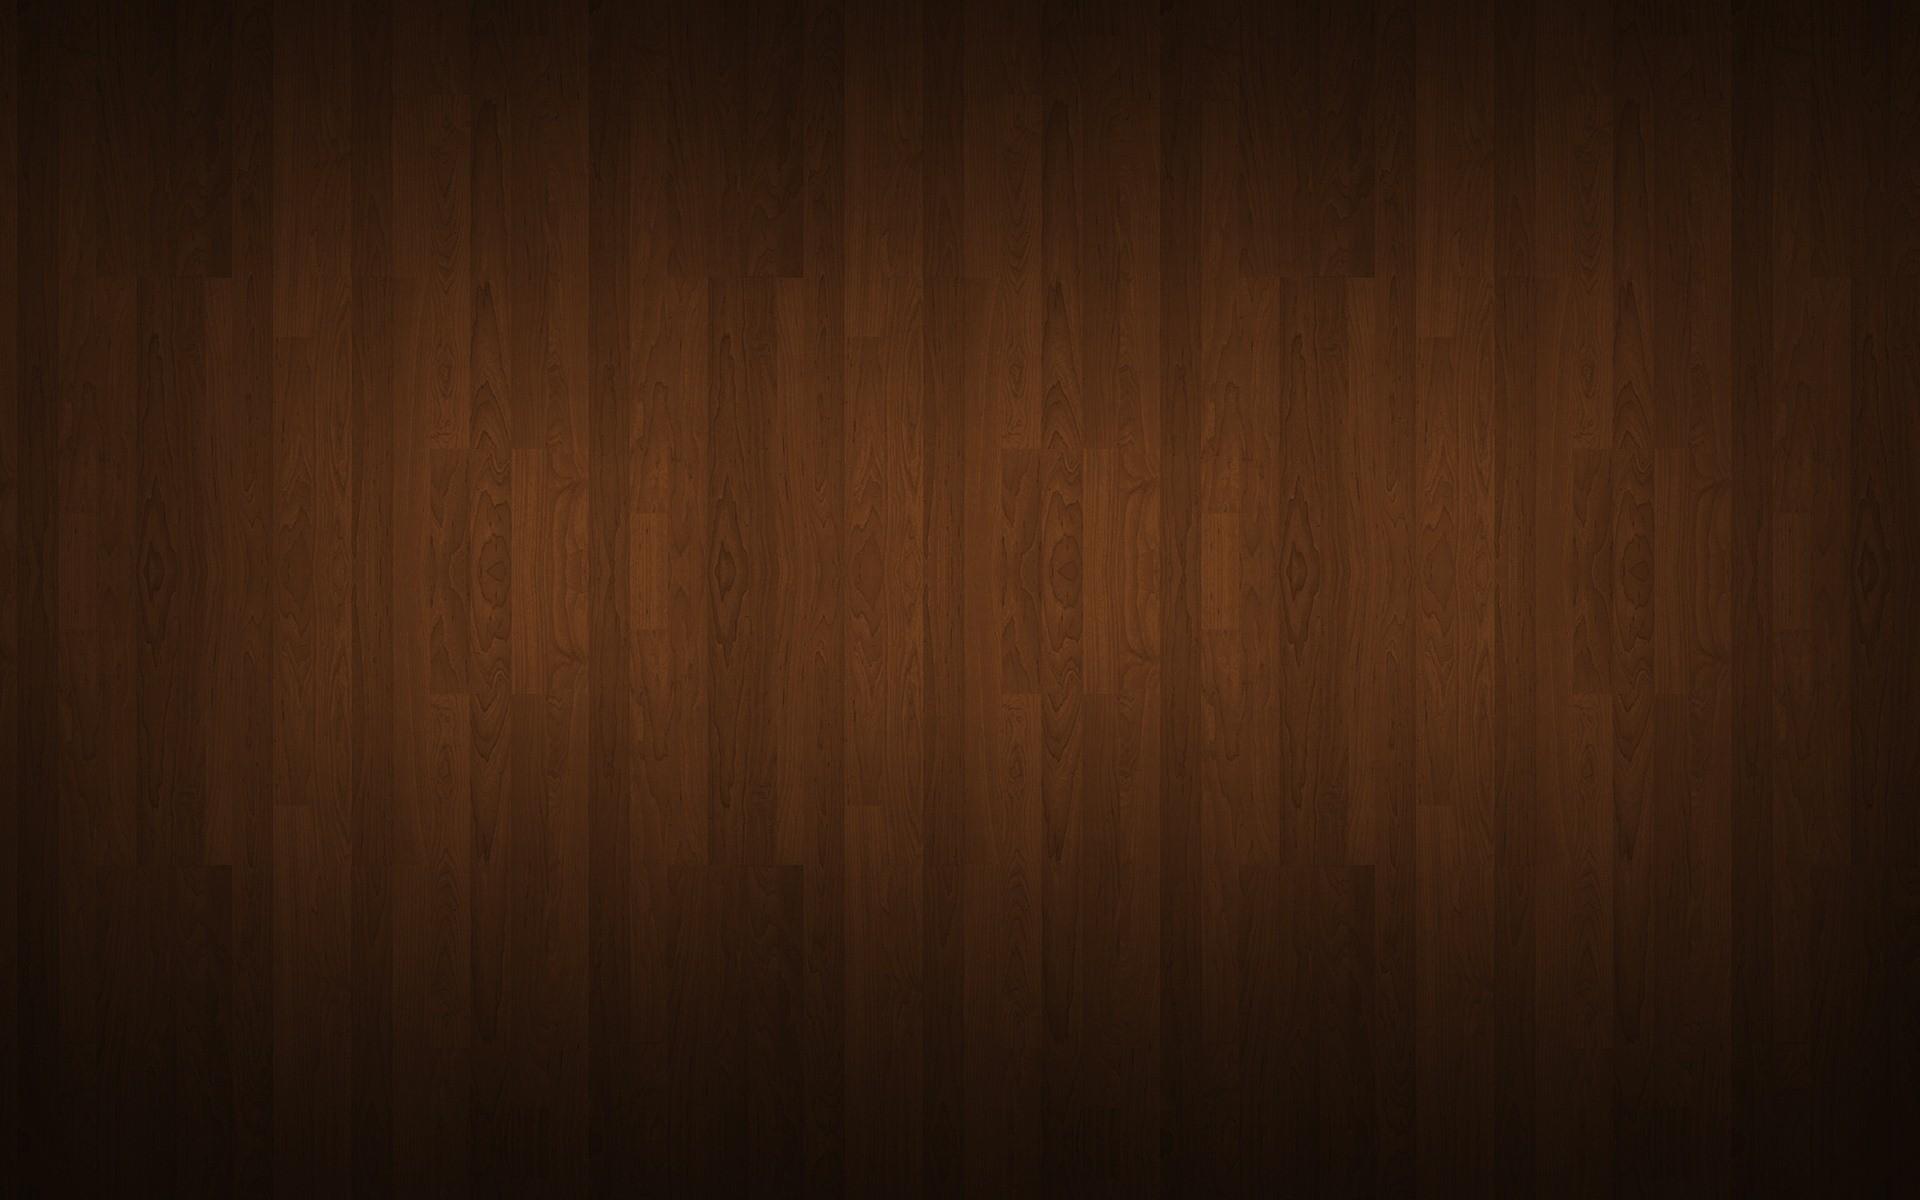 Plain wallpaper ·① Download free High Resolution ...